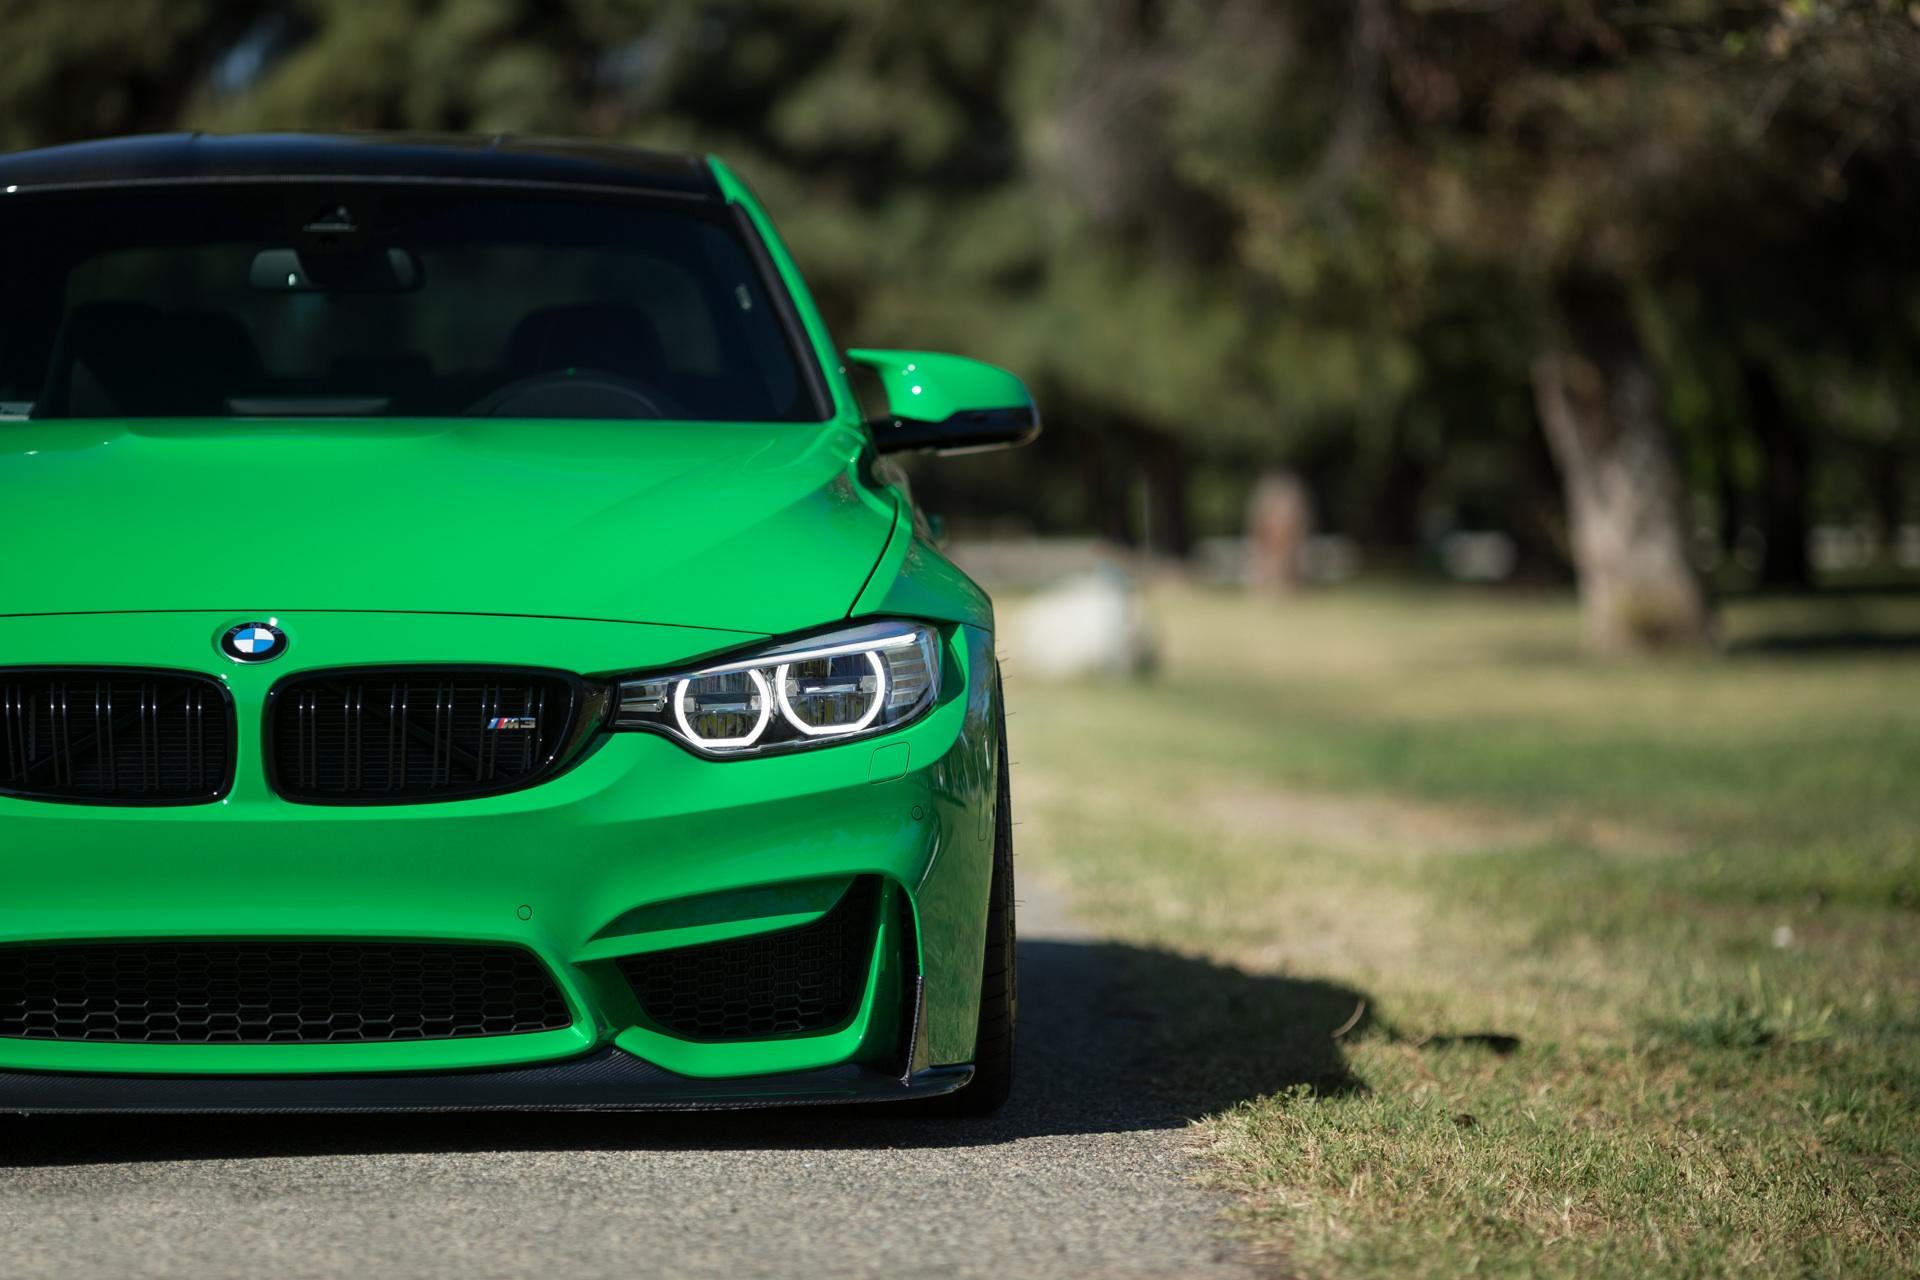 Green Hornet, BMW, Car, Comfort, Comfortable, HQ Photo